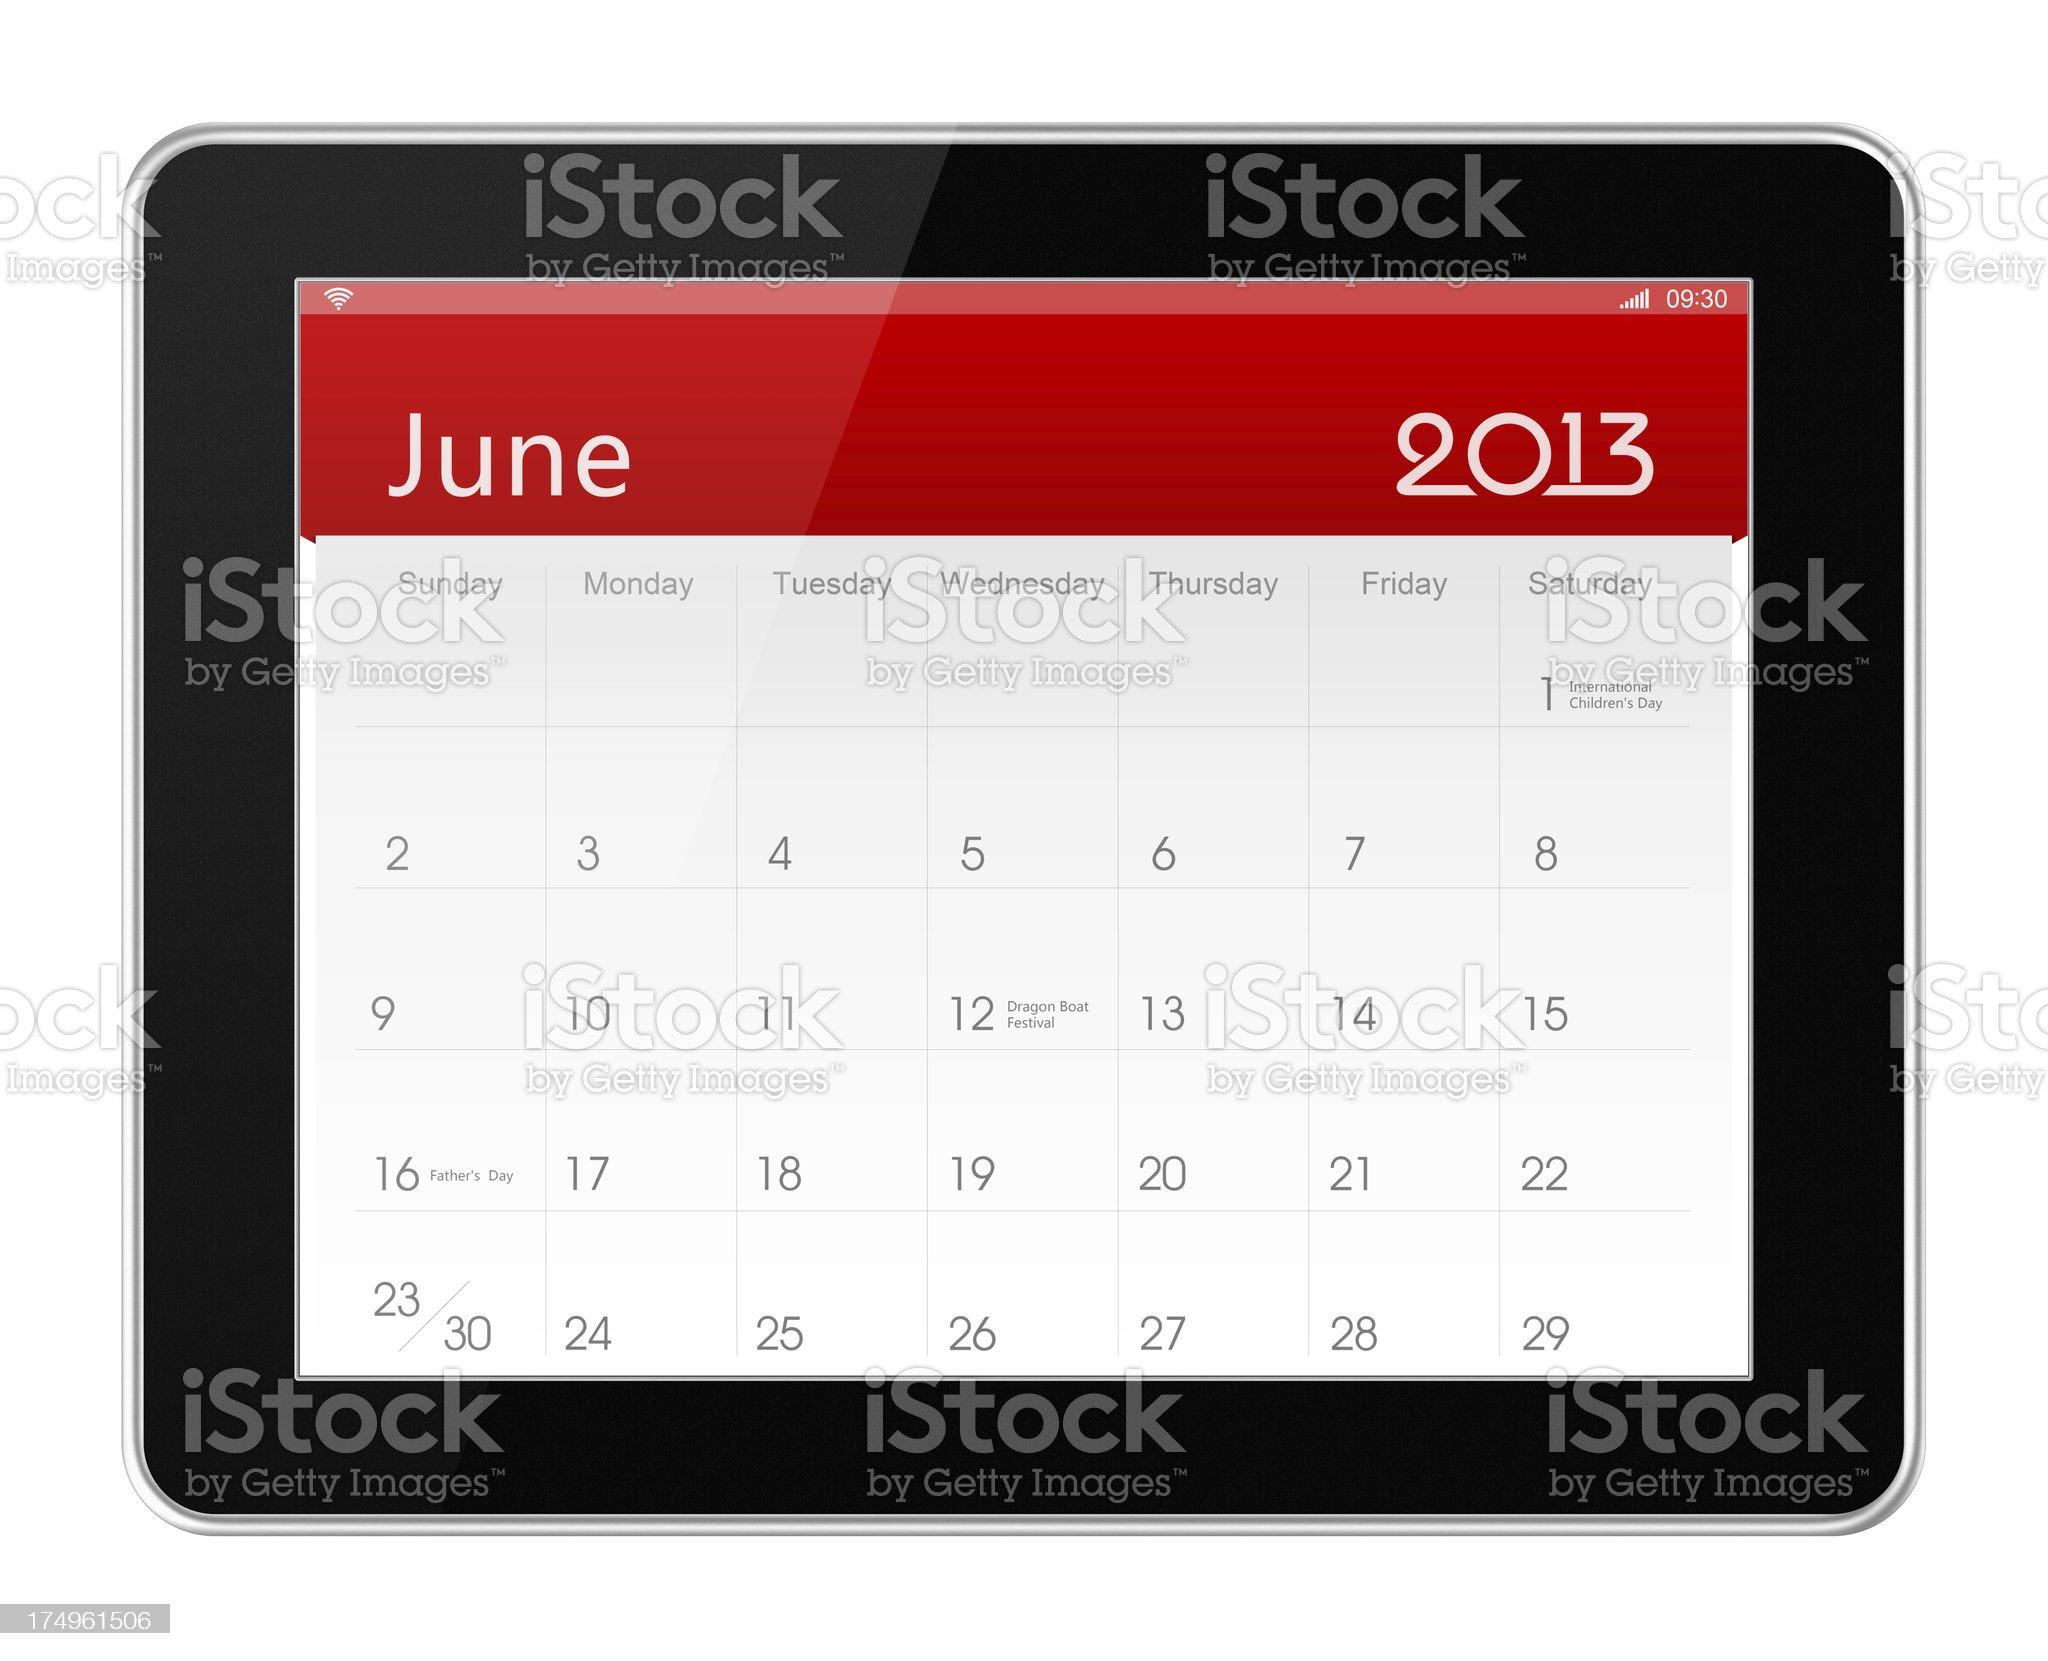 June 2013 Calender on digital tablet royalty-free stock photo